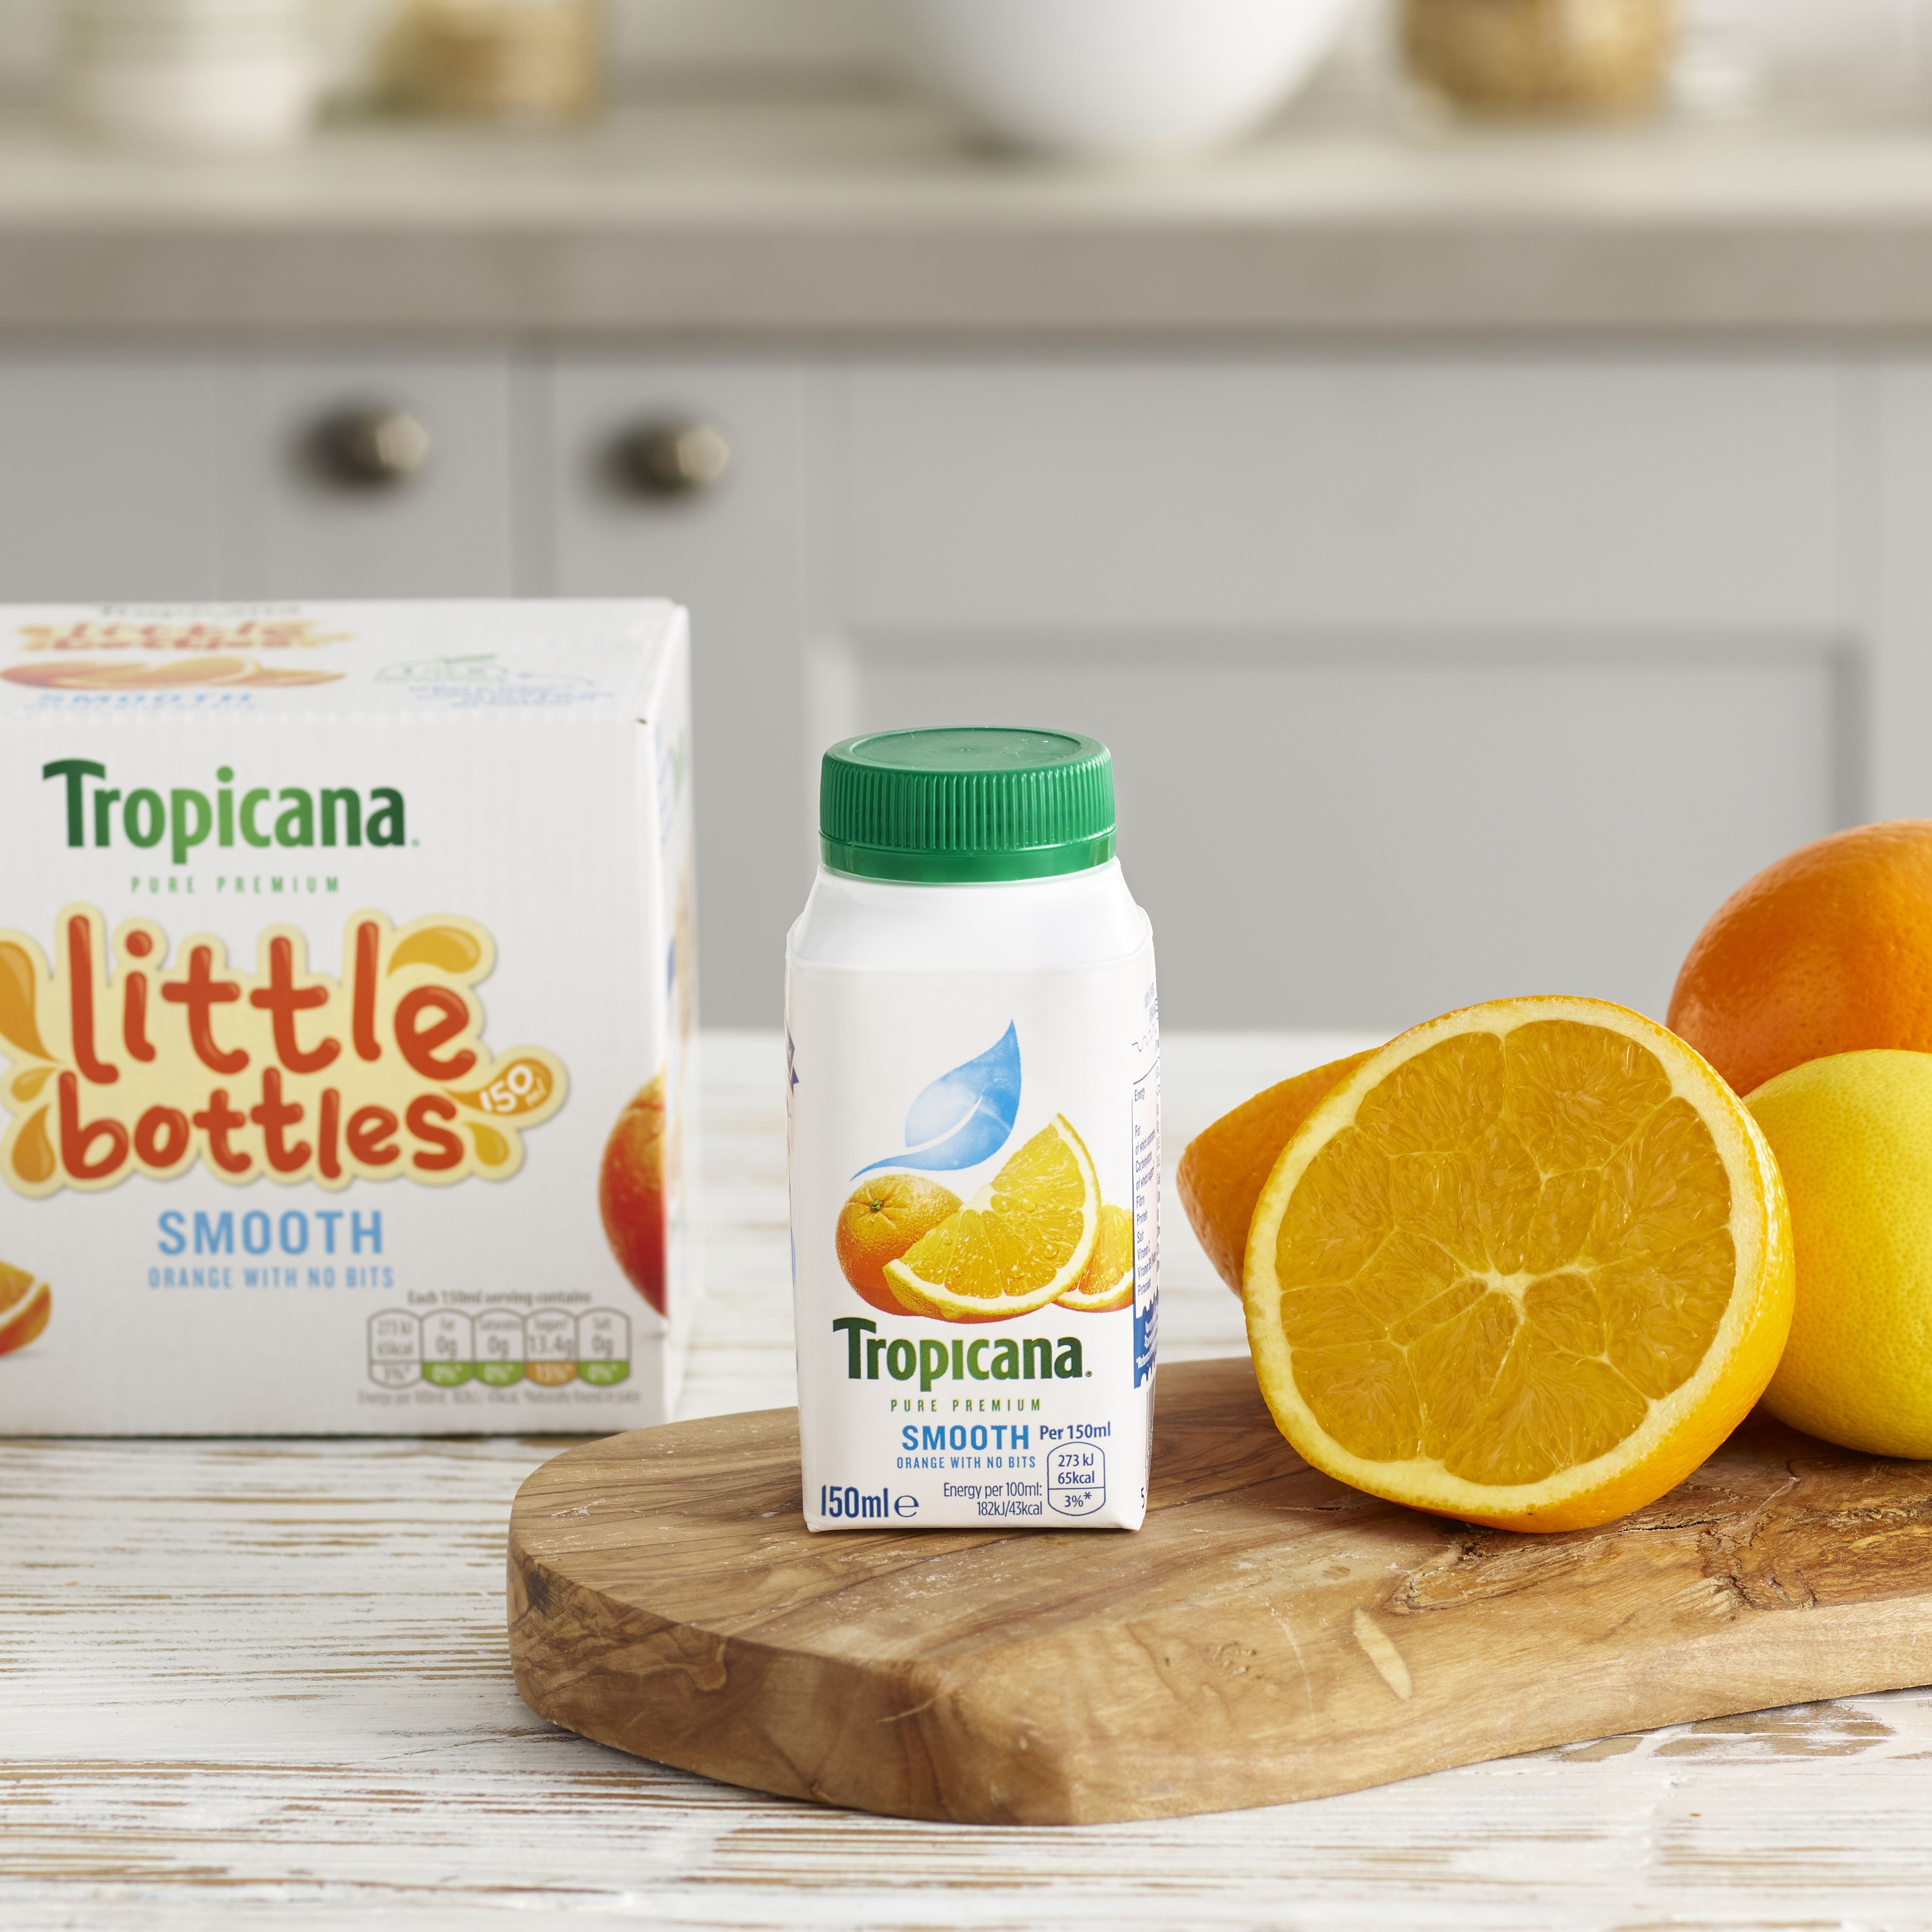 Tropicana little bottles, Orange 6 x 150ml